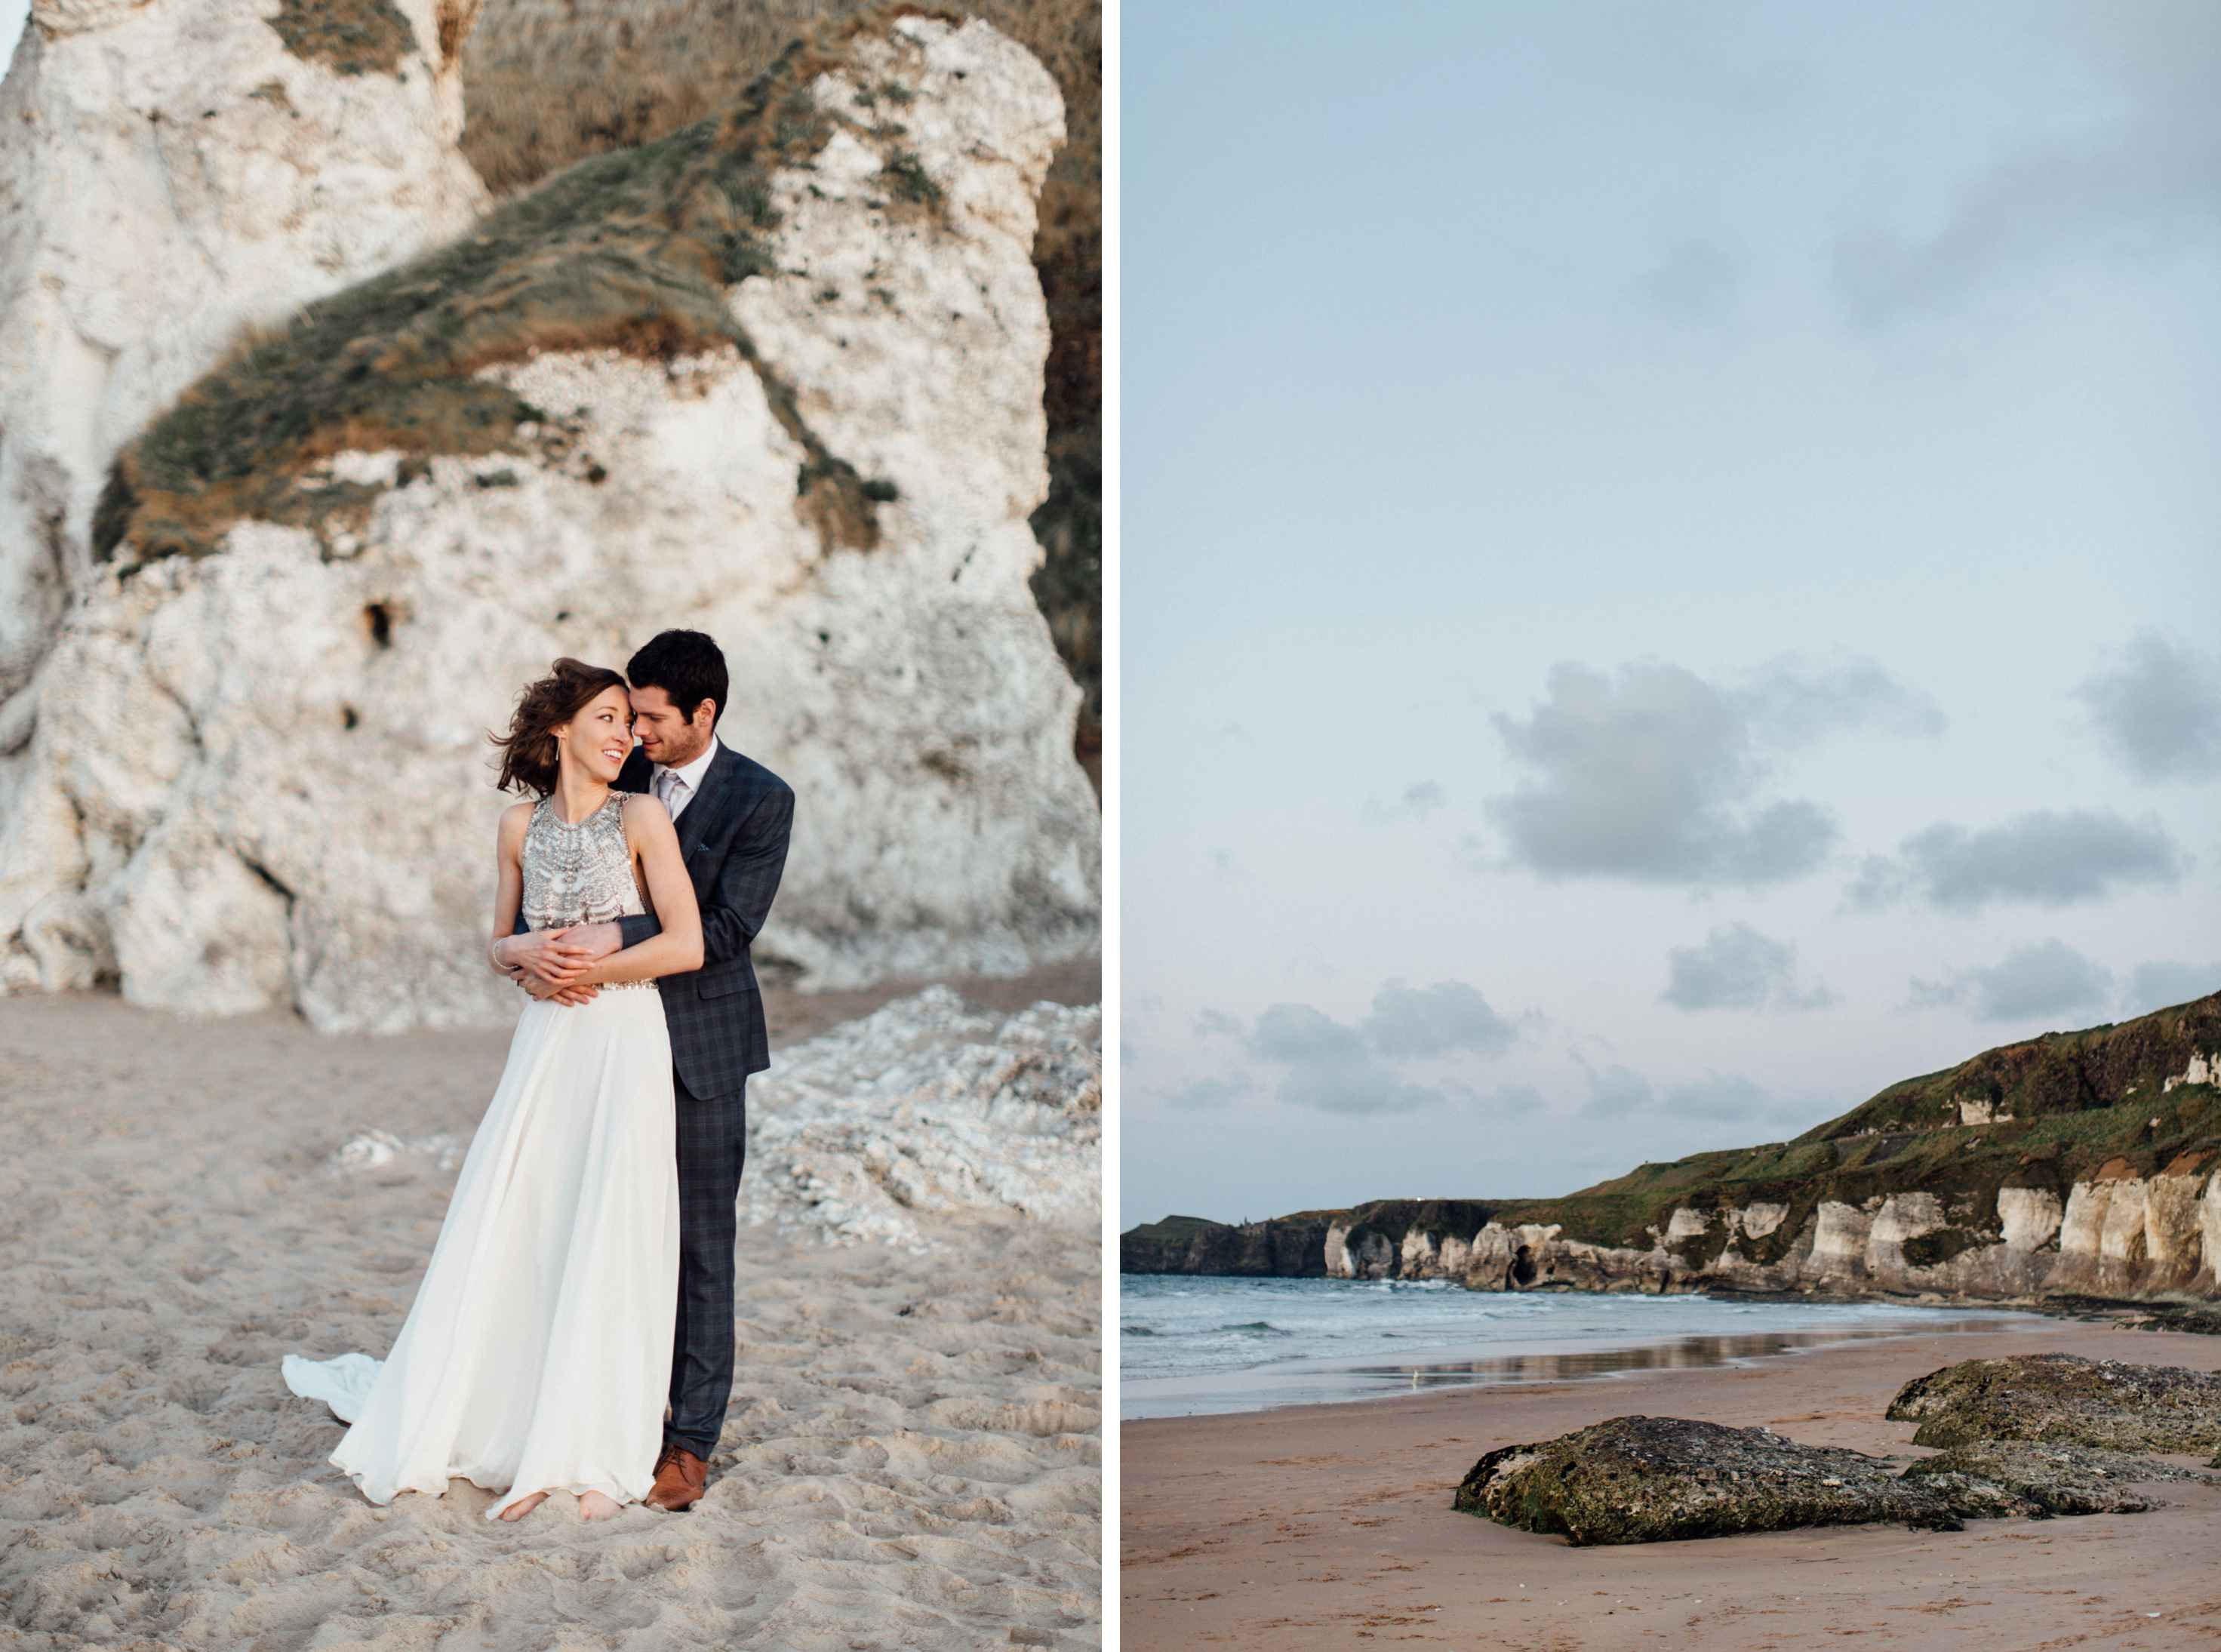 peter-carvill-weddings-fine-art-white-rocks-beach_0201